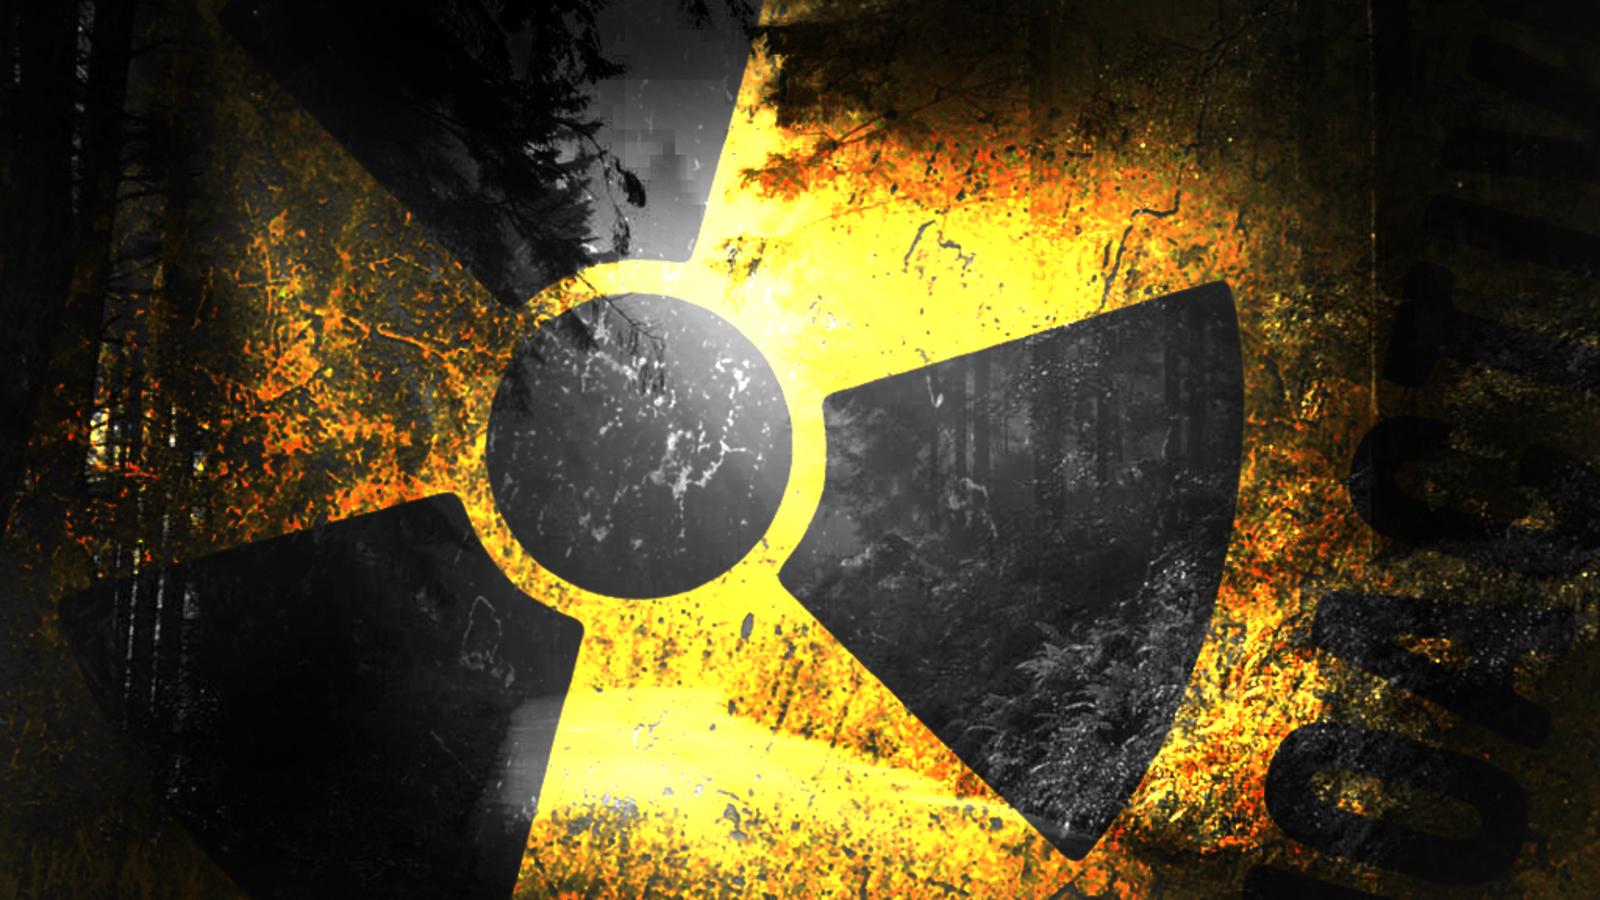 Download Nuclear Wallpaper 1600x900 Wallpoper 333436 1600x900